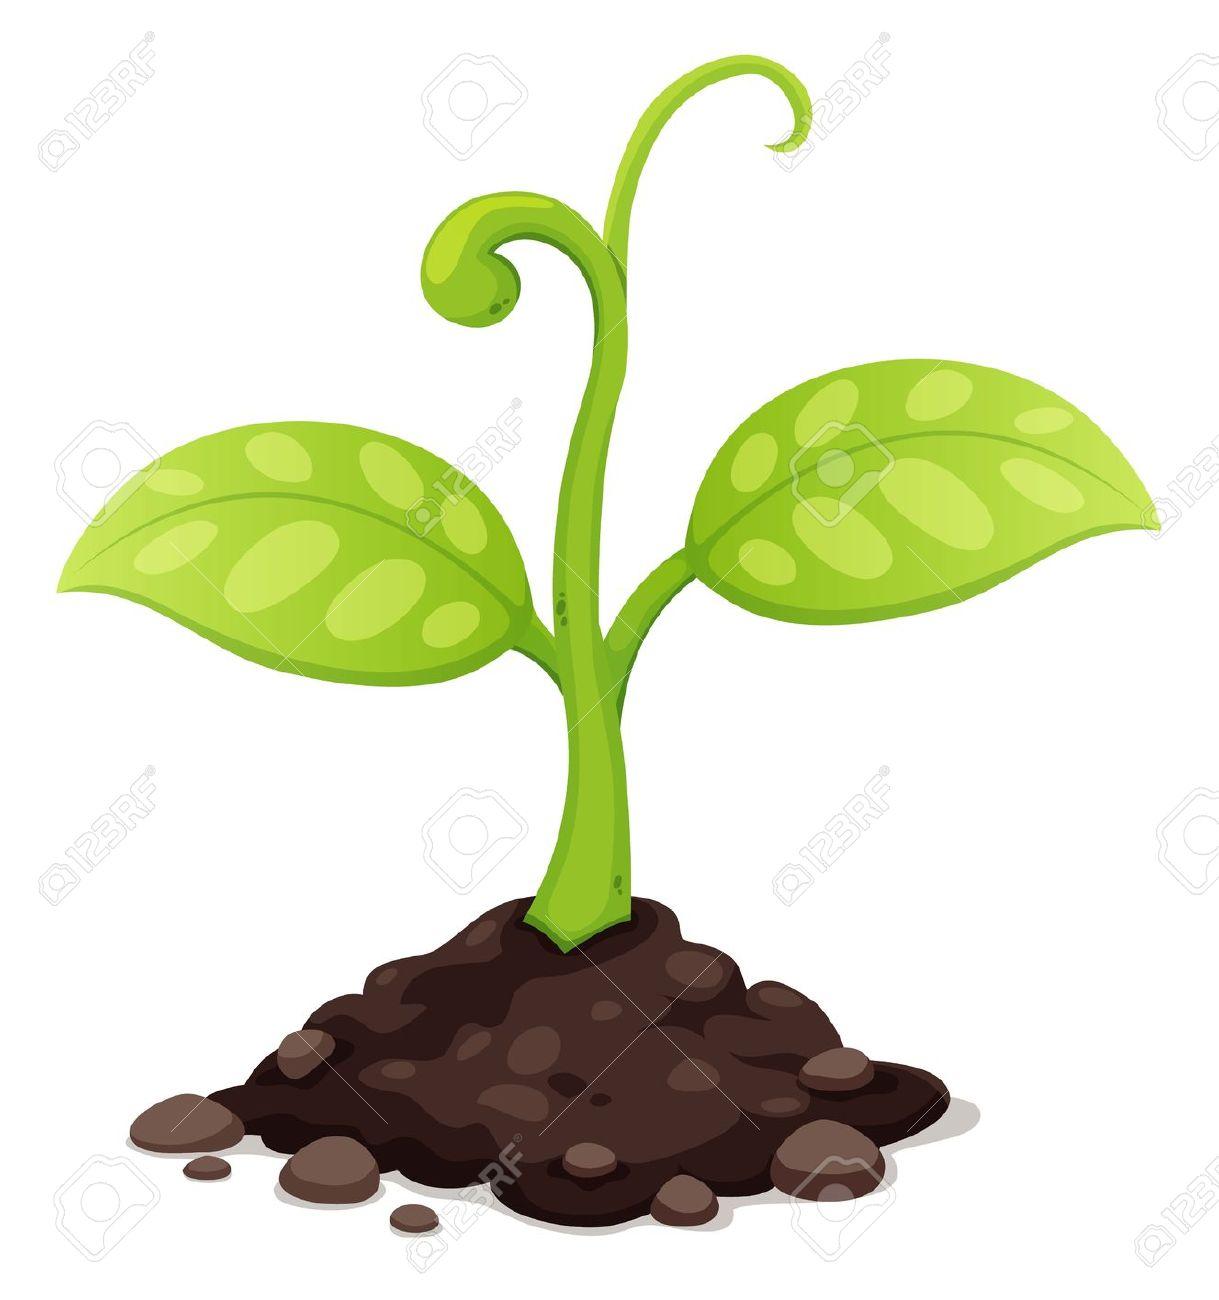 Soil clipart Soil Clipart Clipart Download Soil